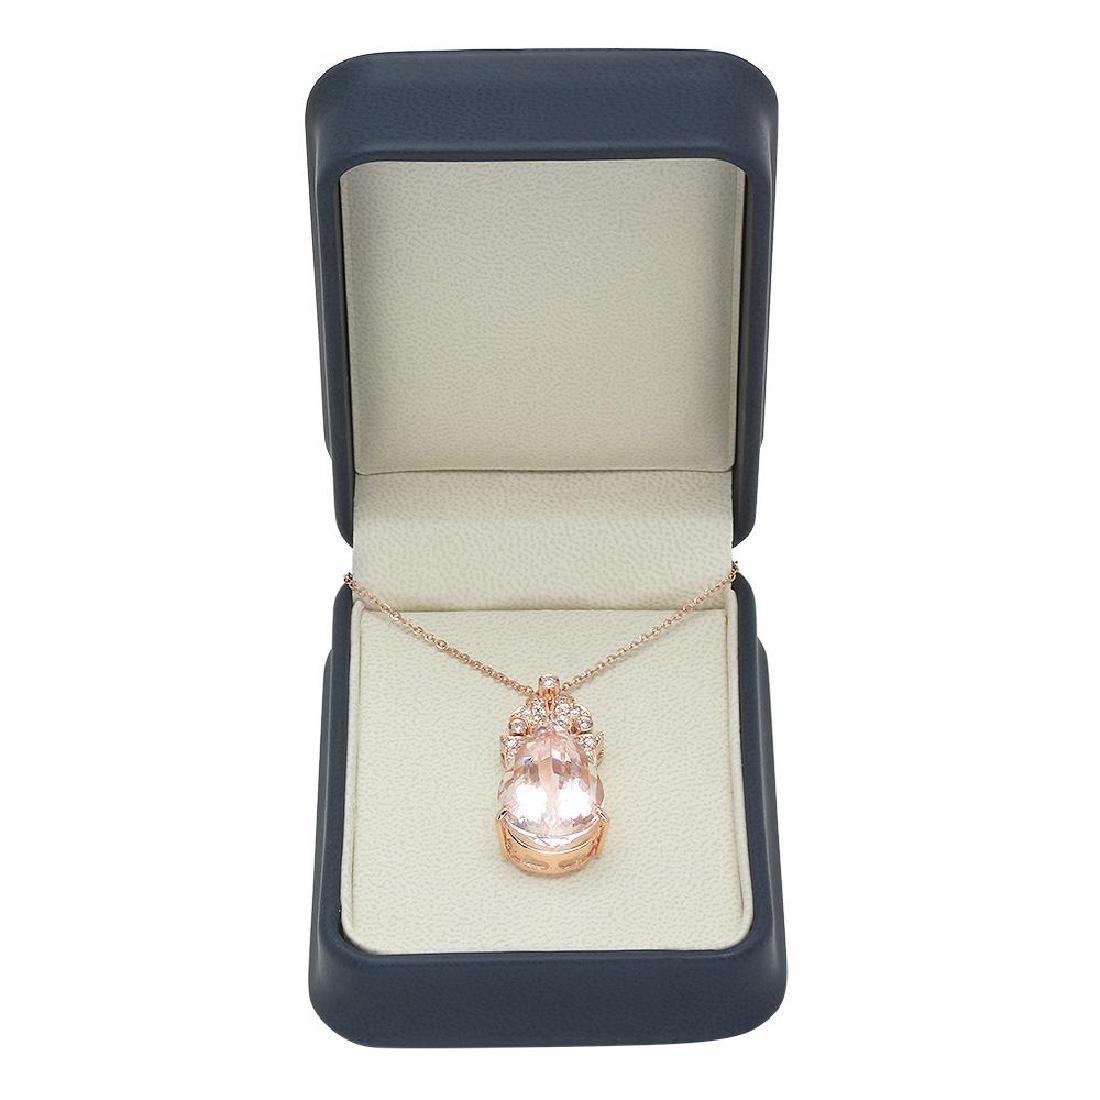 14K Gold 21.98ct Morganite 0.81ct Diamond Pendant - 3